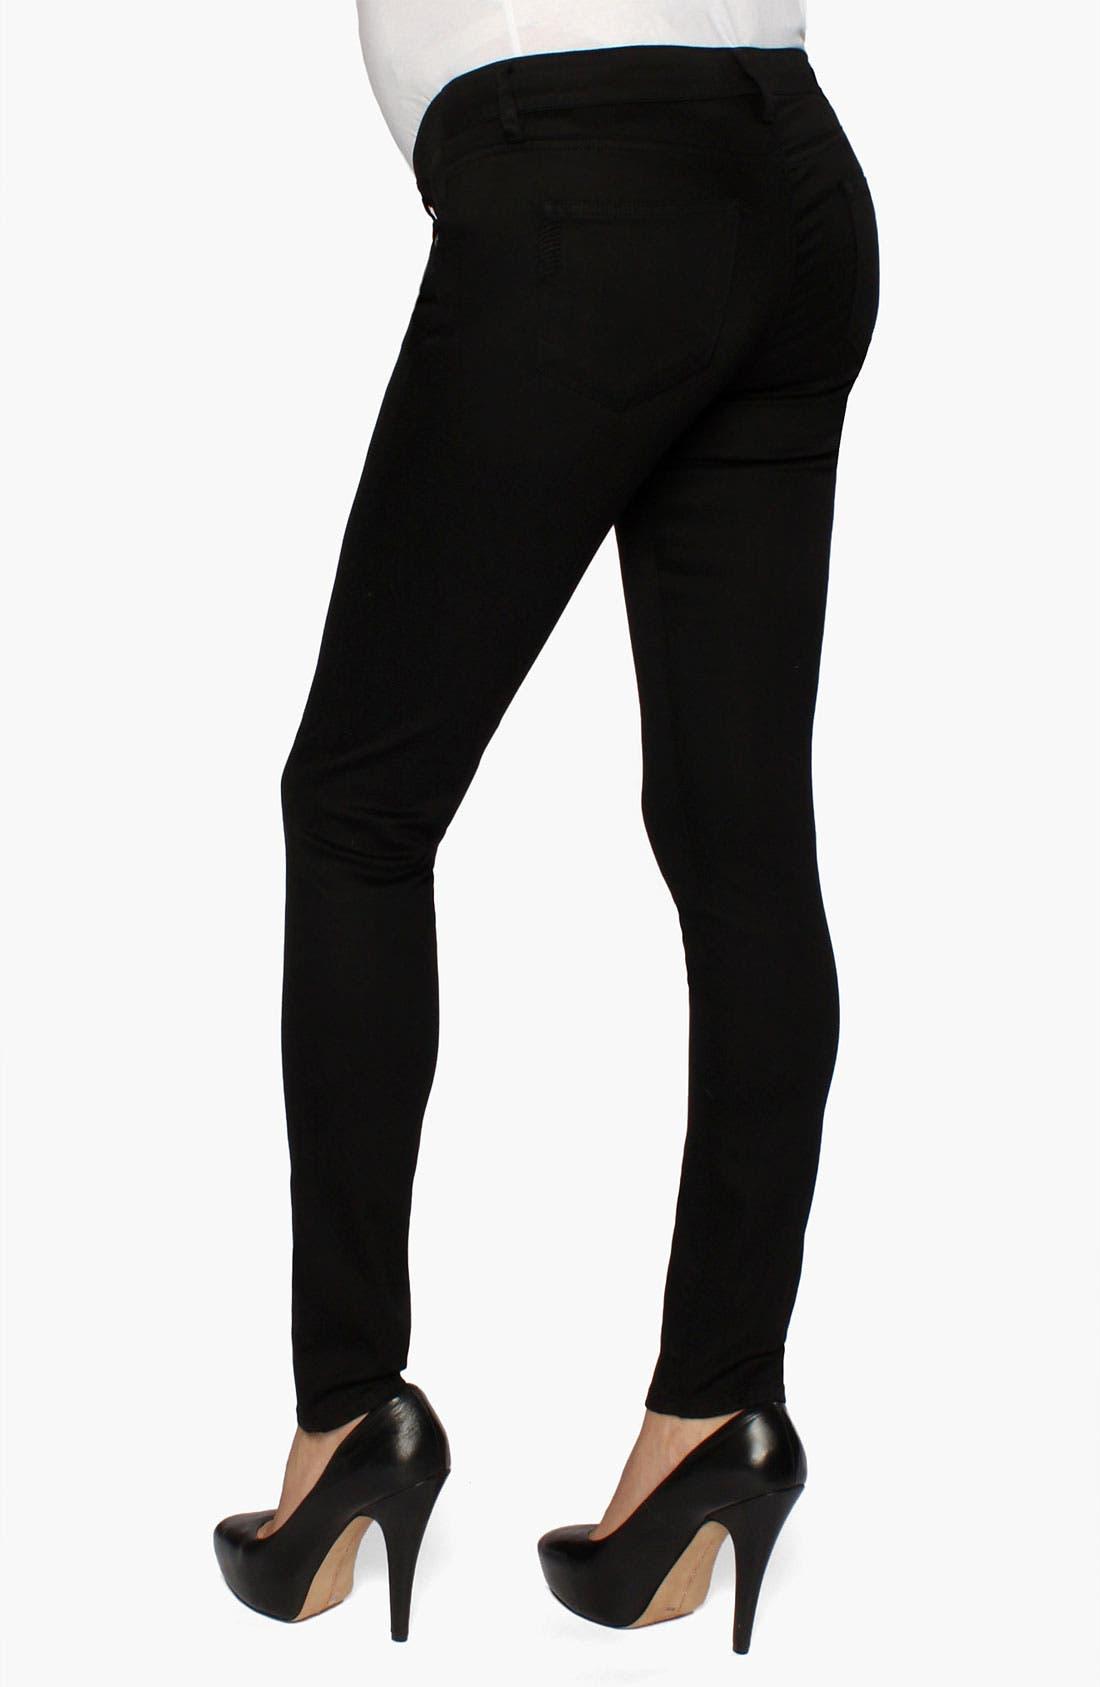 Denim 'Verdugo' Maternity Ultra Skinny Jeans,                         Main,                         color, 001